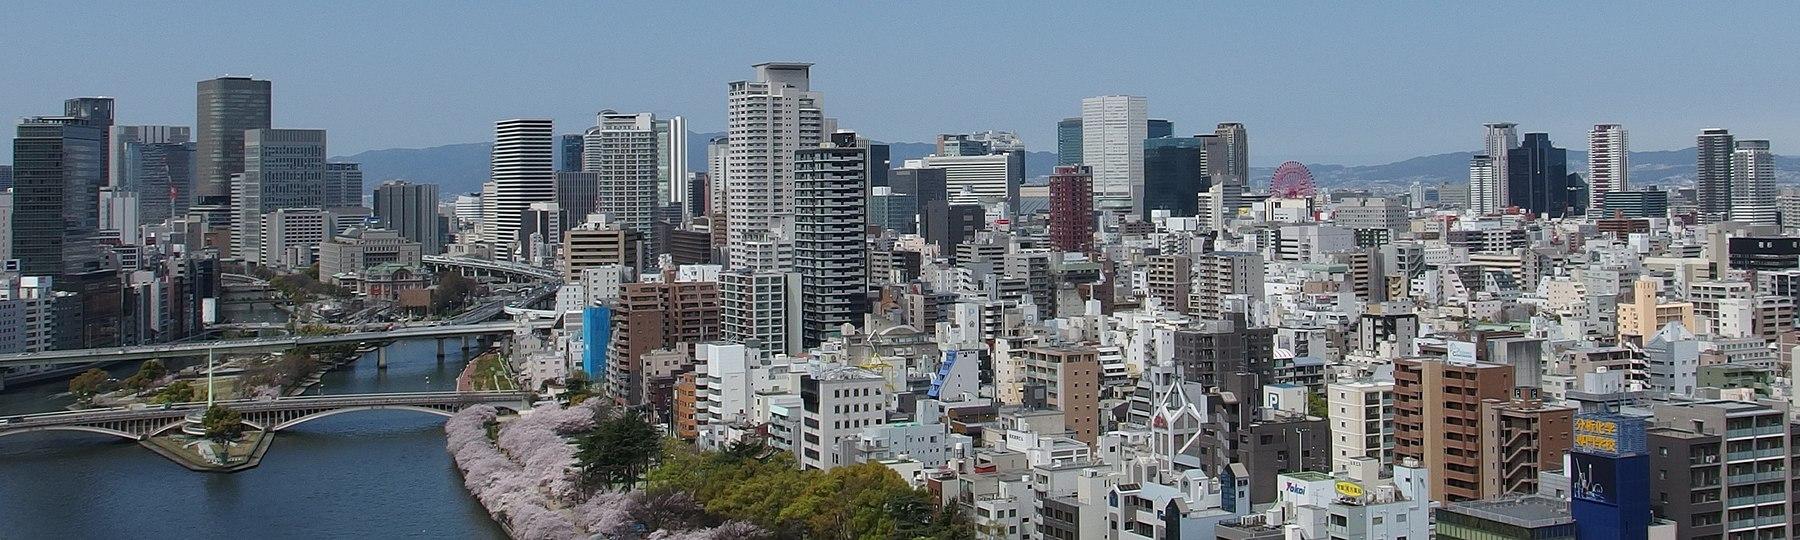 Nakanoshima and Umeda Skyscrapers in 201504 001.jpg